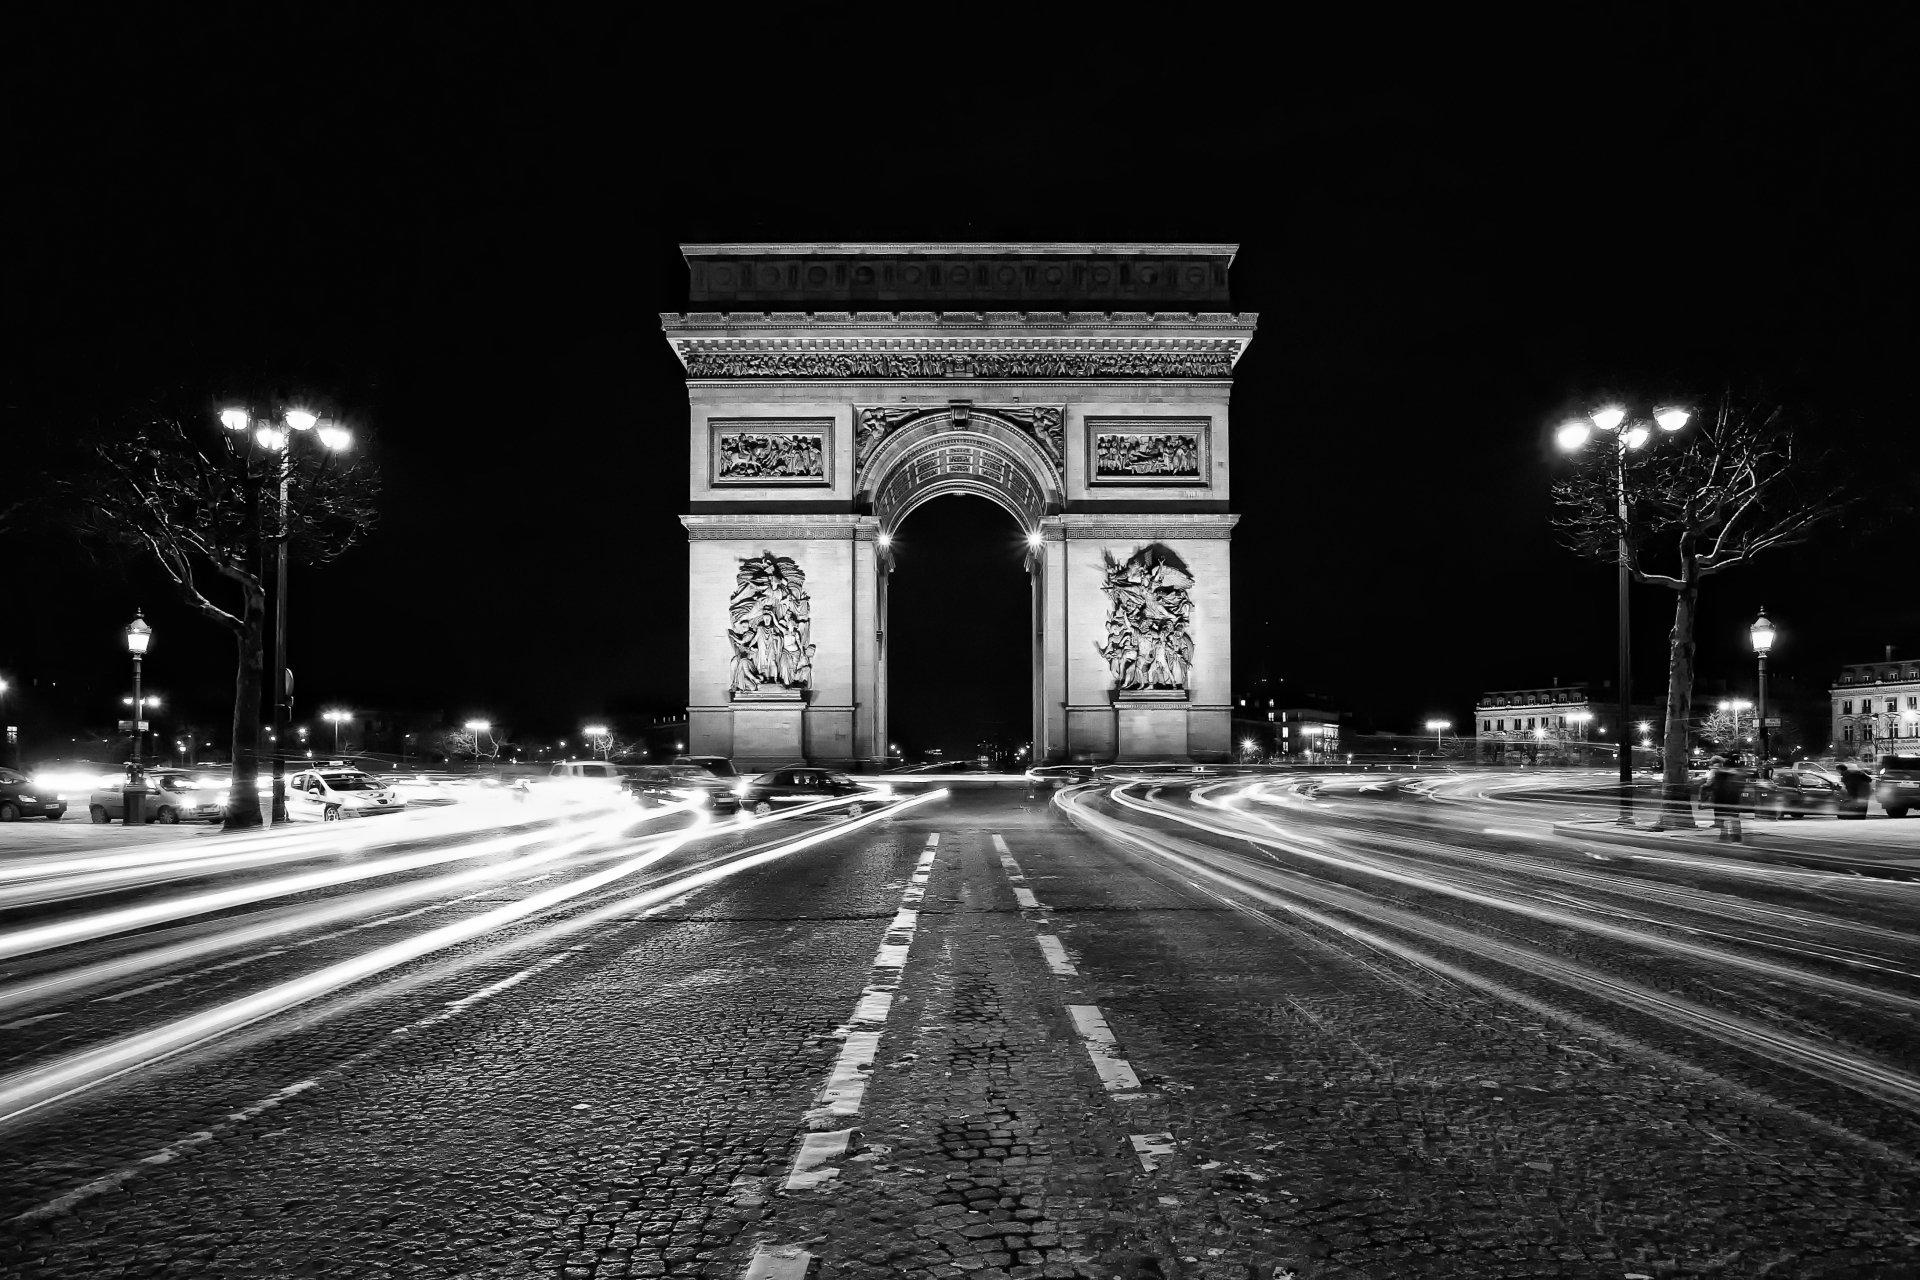 Arc De Triomphe 4k Ultra HD Wallpaper